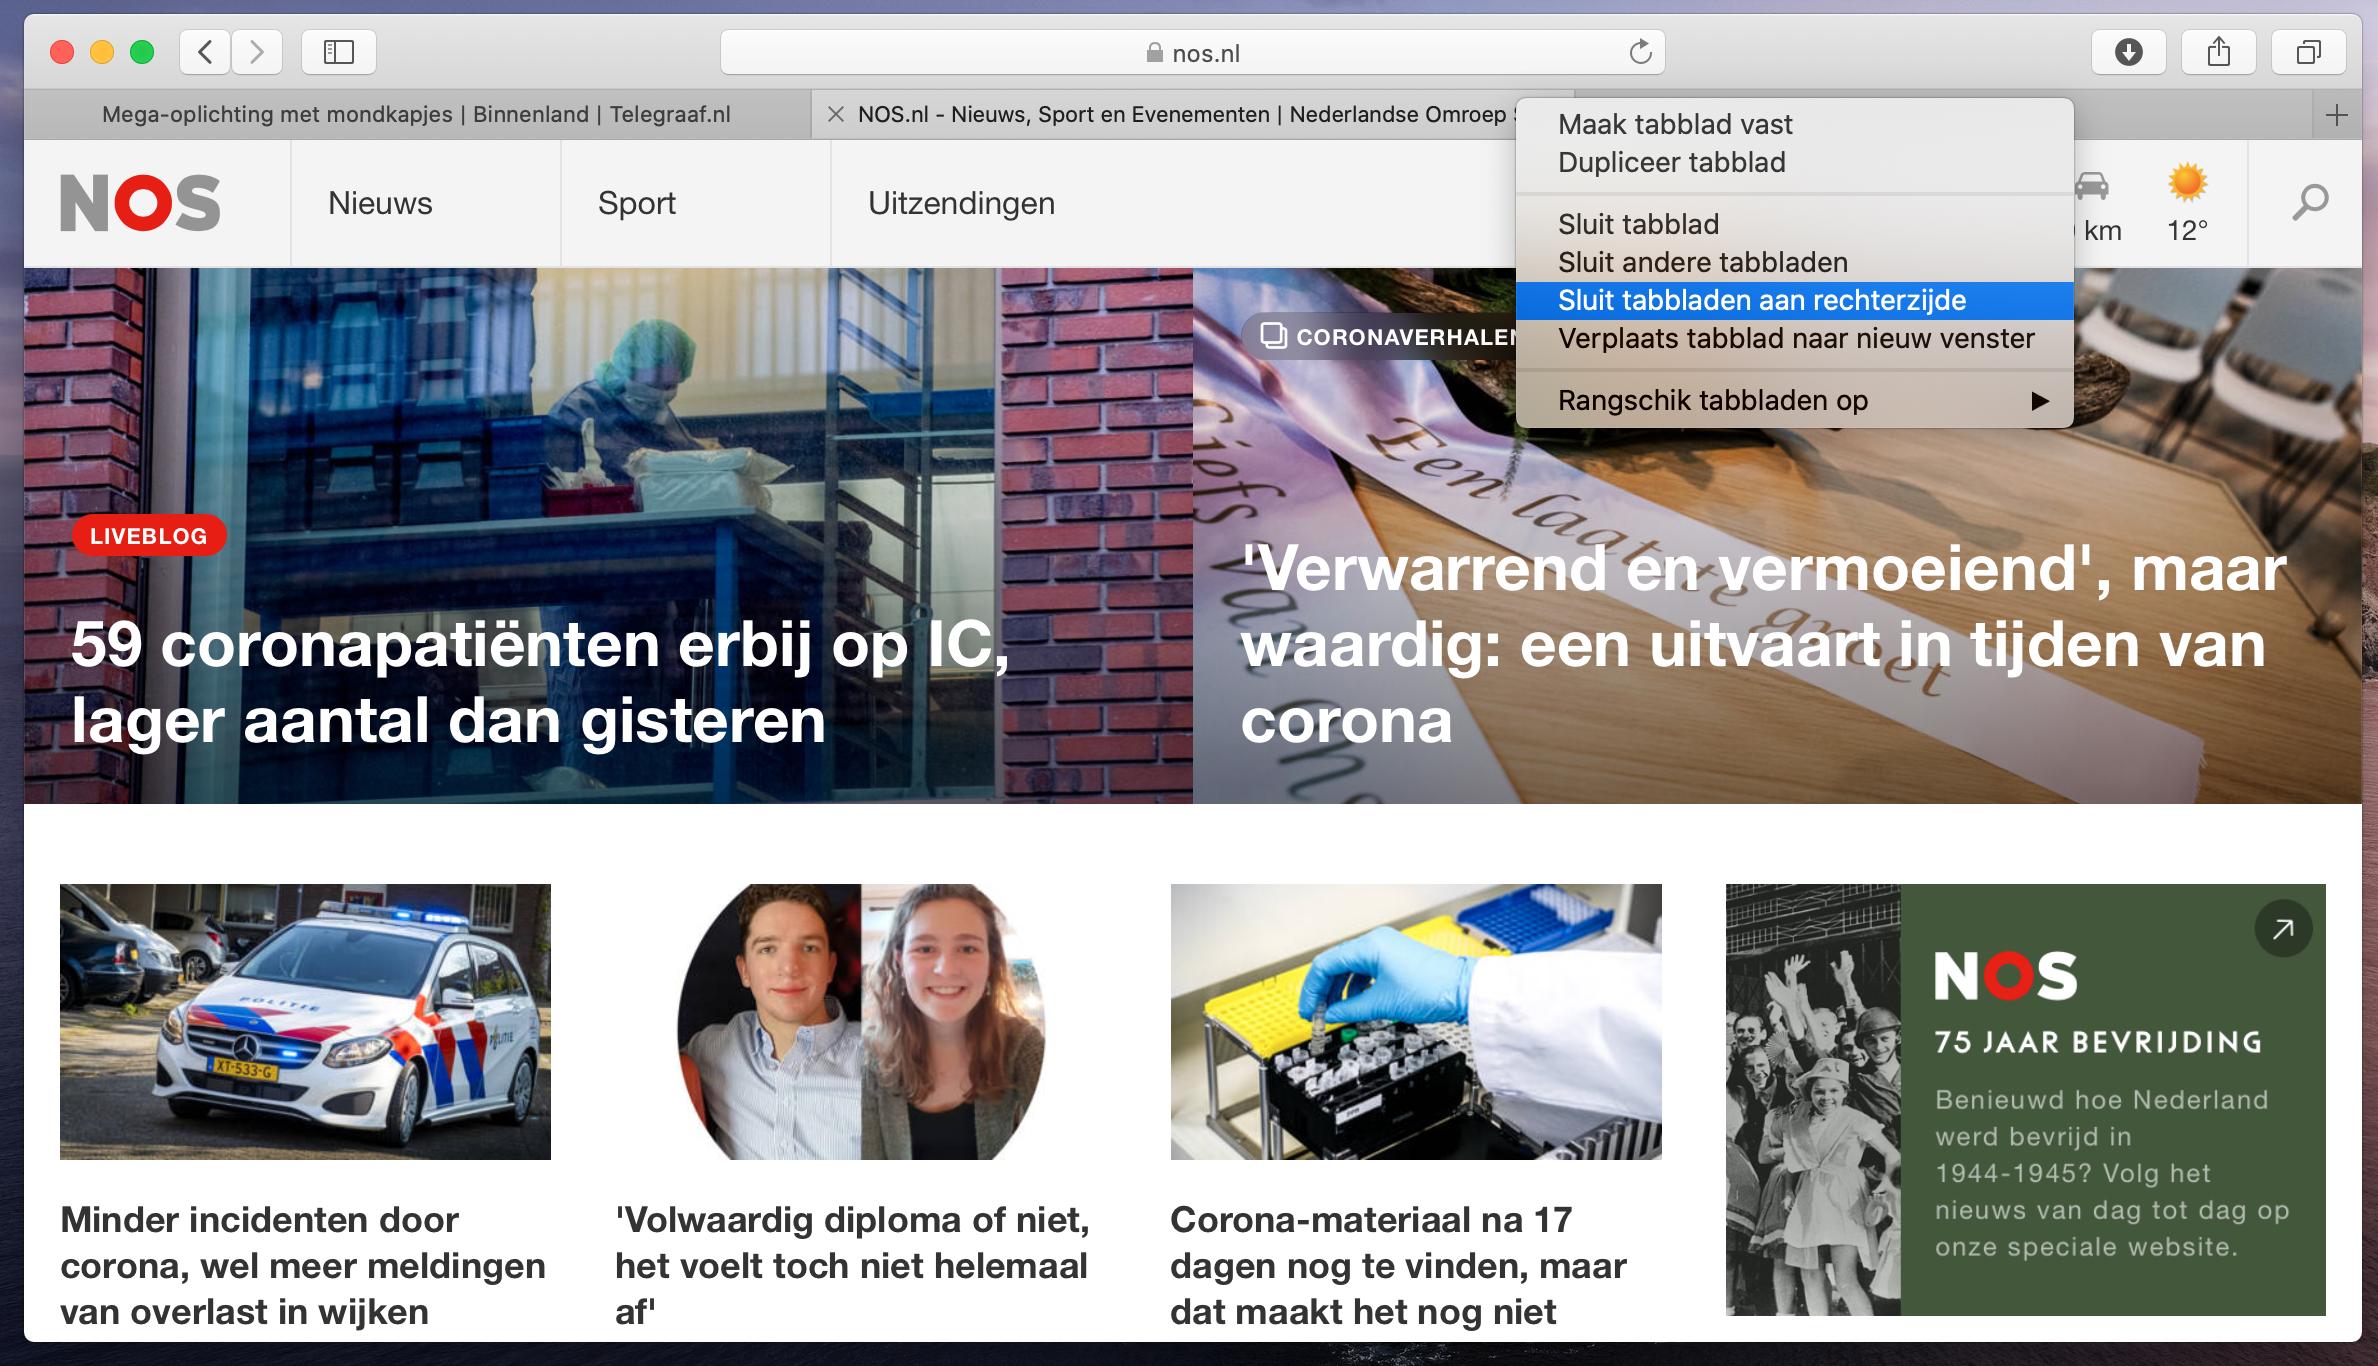 Safari macOS Catalina 10.15.4